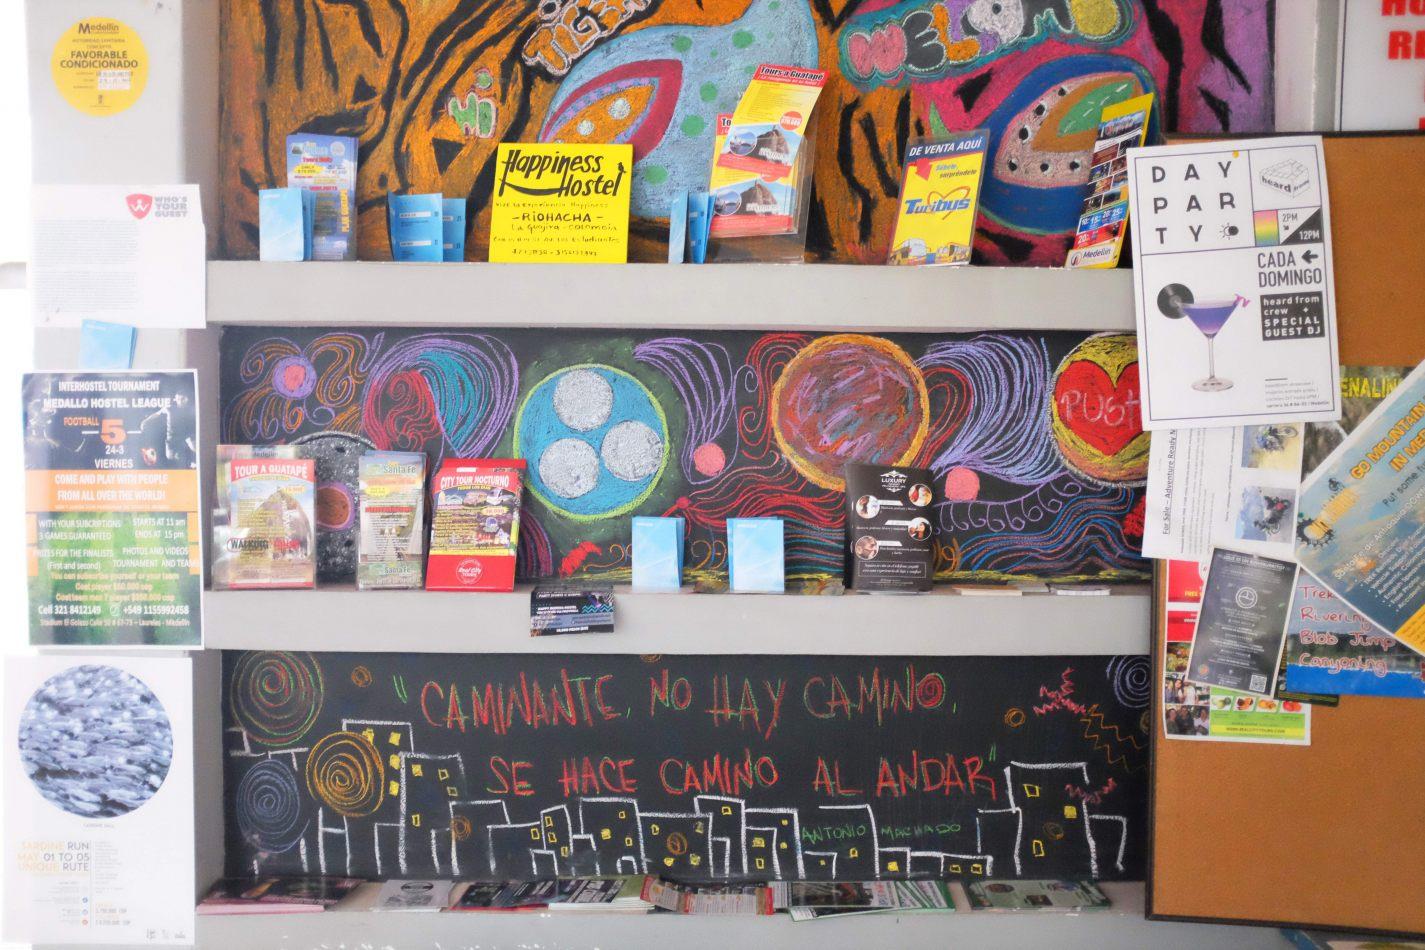 Hibiscus & Nomada : Medell� n - Tiger Paw Hostel